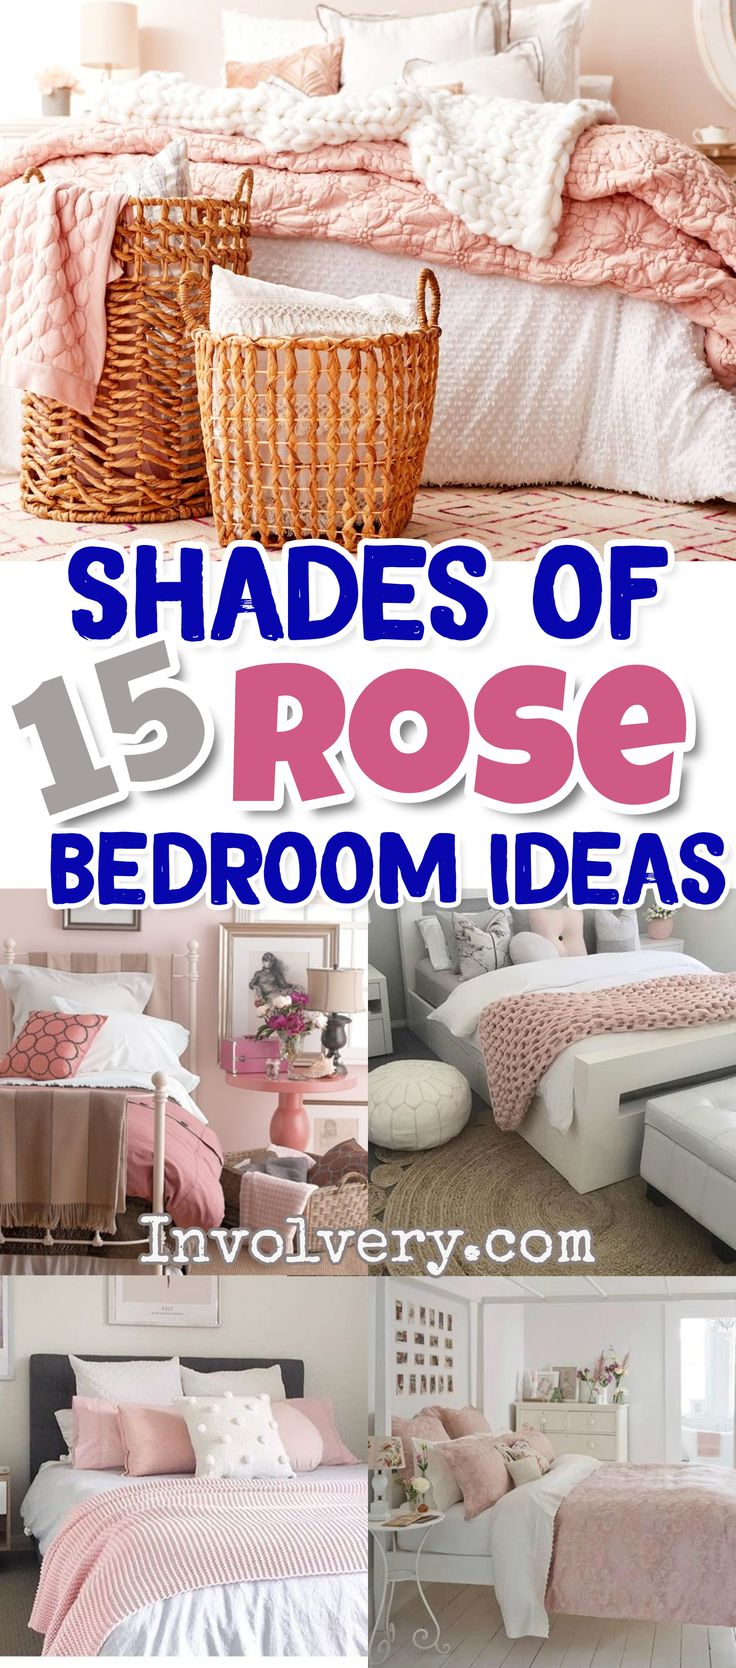 Best 25+ Pink bedroom decor ideas on Pinterest | Rose ...